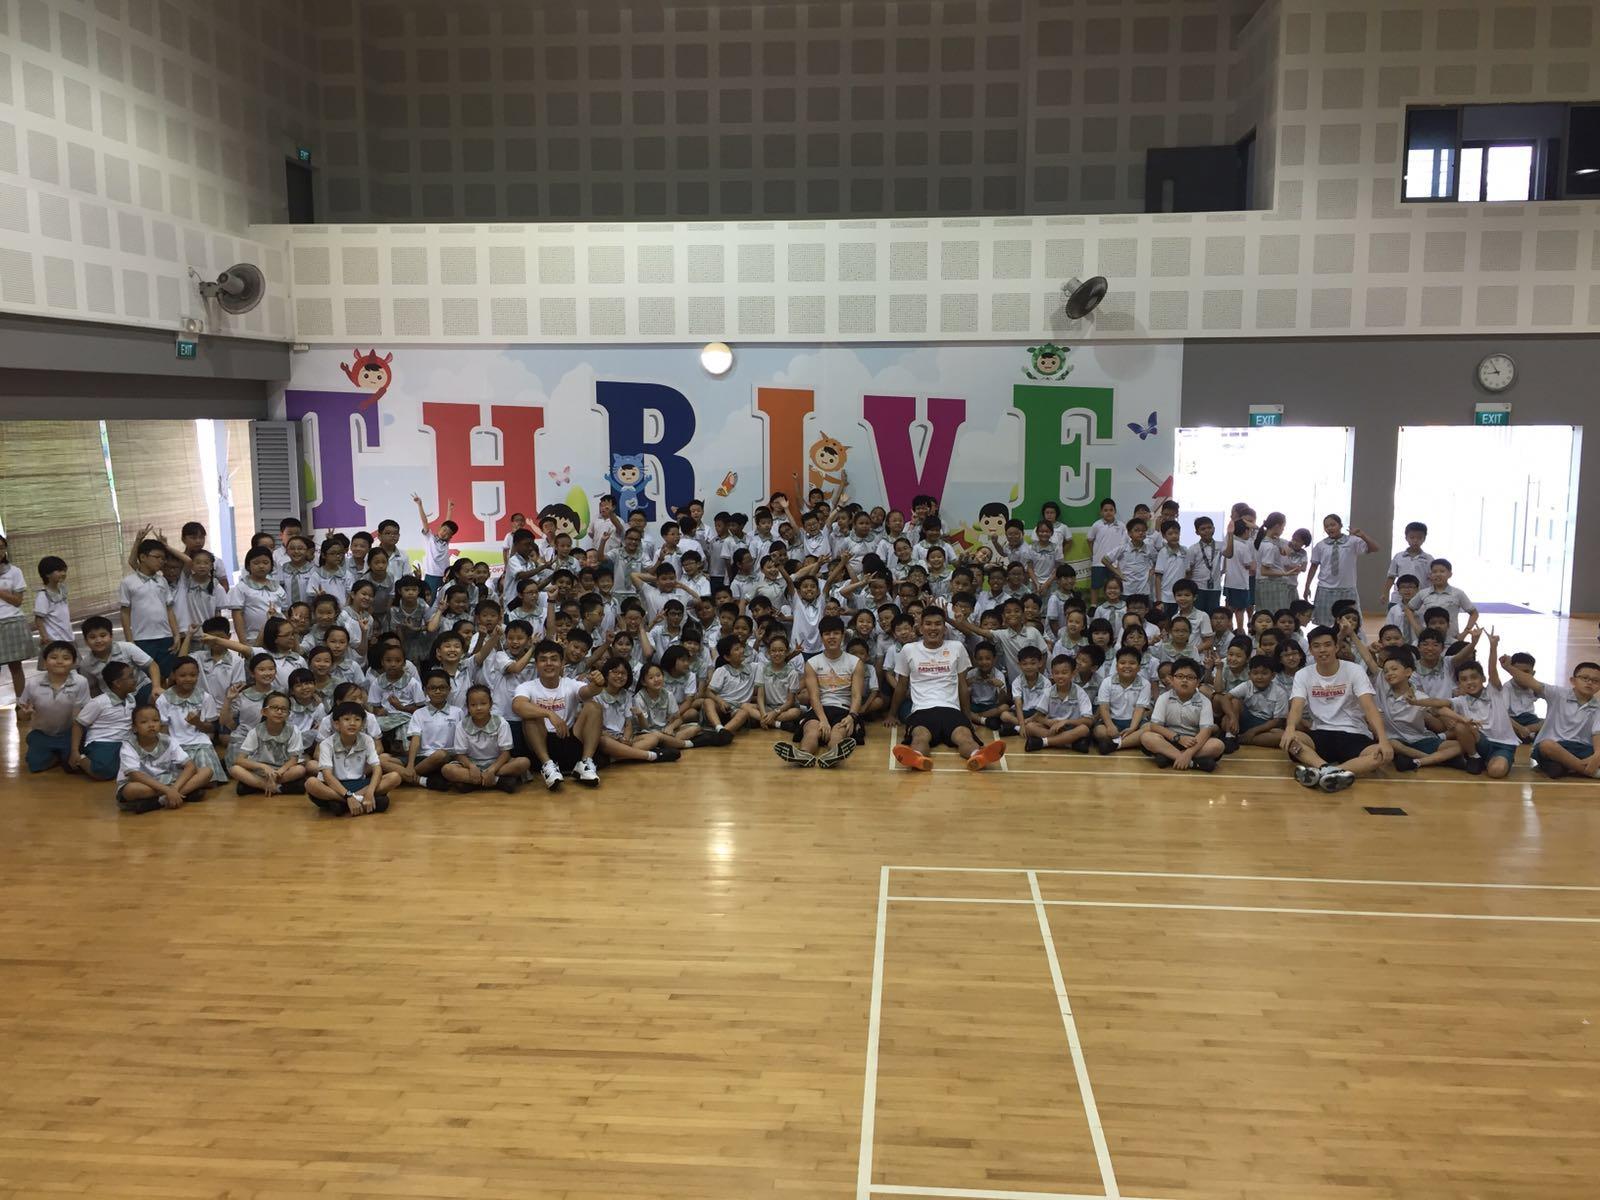 Westwood-Primary-School-17-5-2016